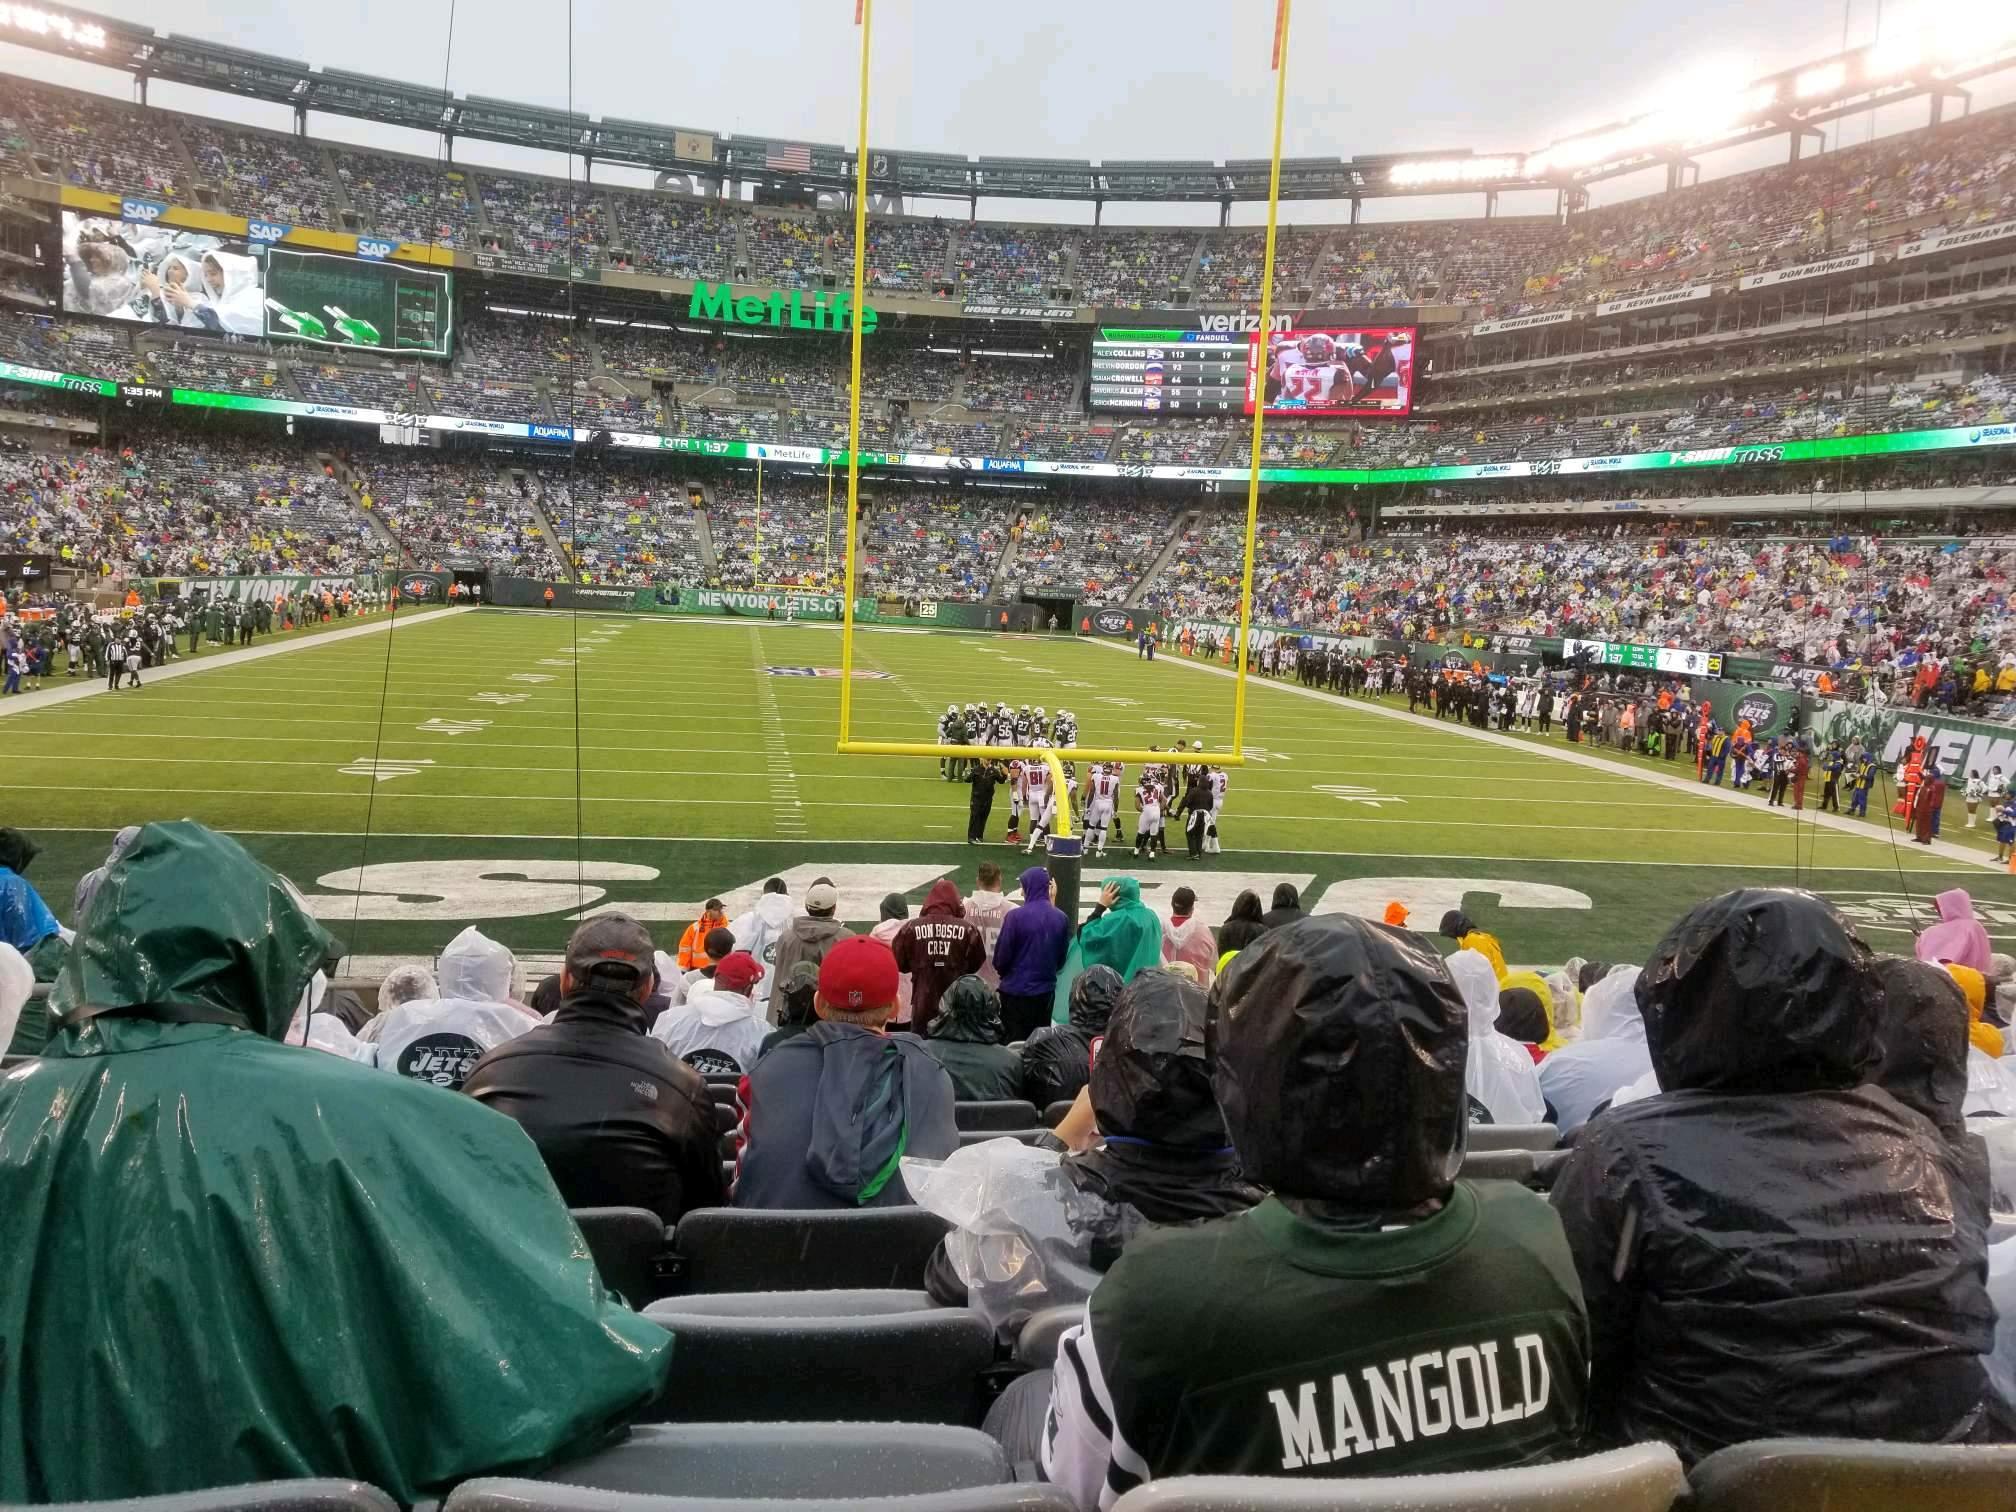 MetLife Stadium Section 101 Row 15 Seat 21